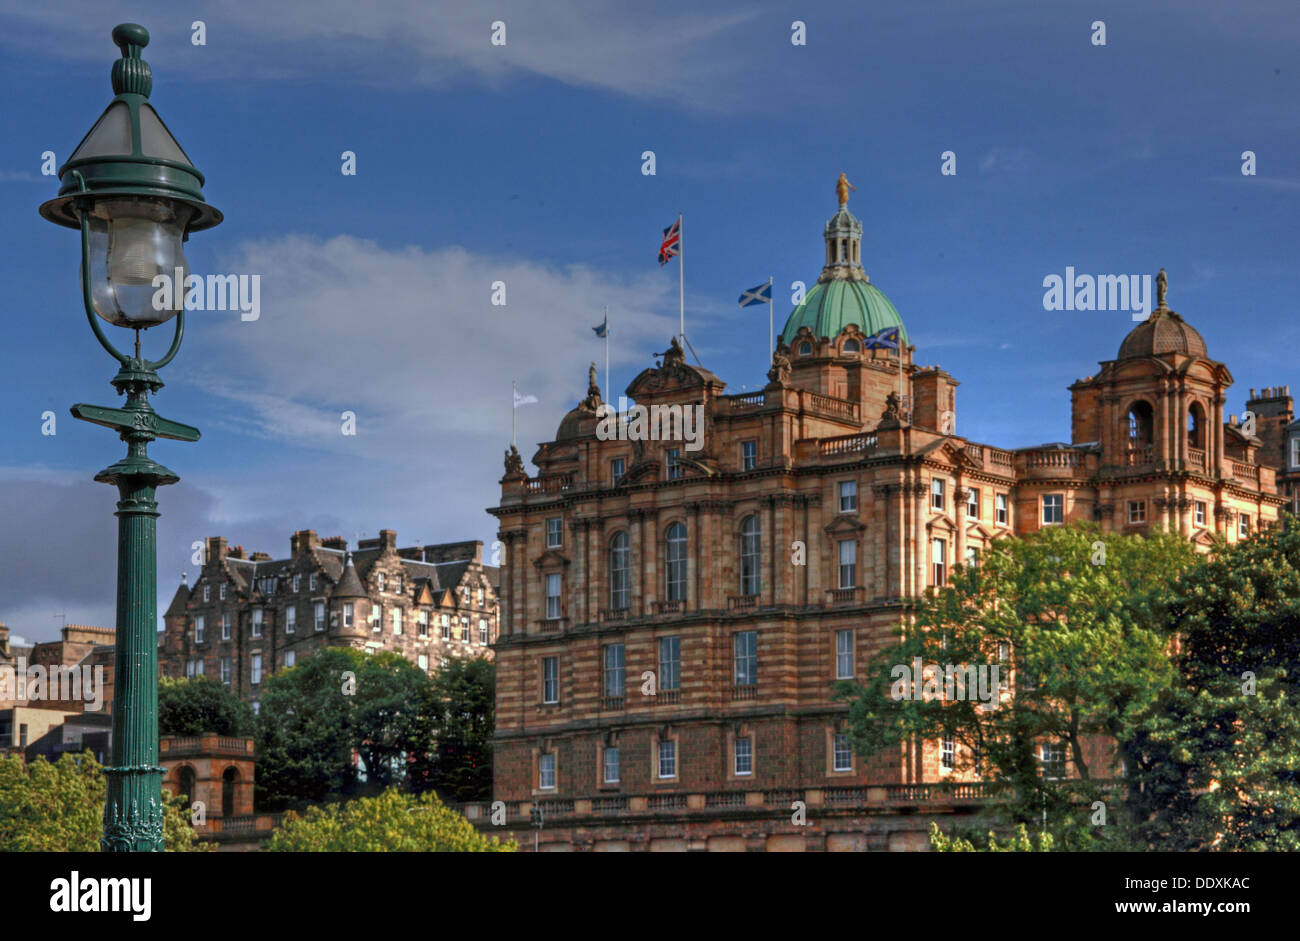 GoTonySmith,@HotpixUK,Tony,Smith,UK,GB,Great,Britain,United,Kingdom,Scotish,Scottish,Scotch,British,Scotland,Alba,problem,with,problem with,issue with,Buy Pictures of,Buy Images Of,Images of,Stock Images,Tony Smith,United Kingdom,Great Britain,British Isles,HQ,Bank of Scotland,office,Bank,iconic,Lloyds,Edinburgh skyline,landscape,finance,system